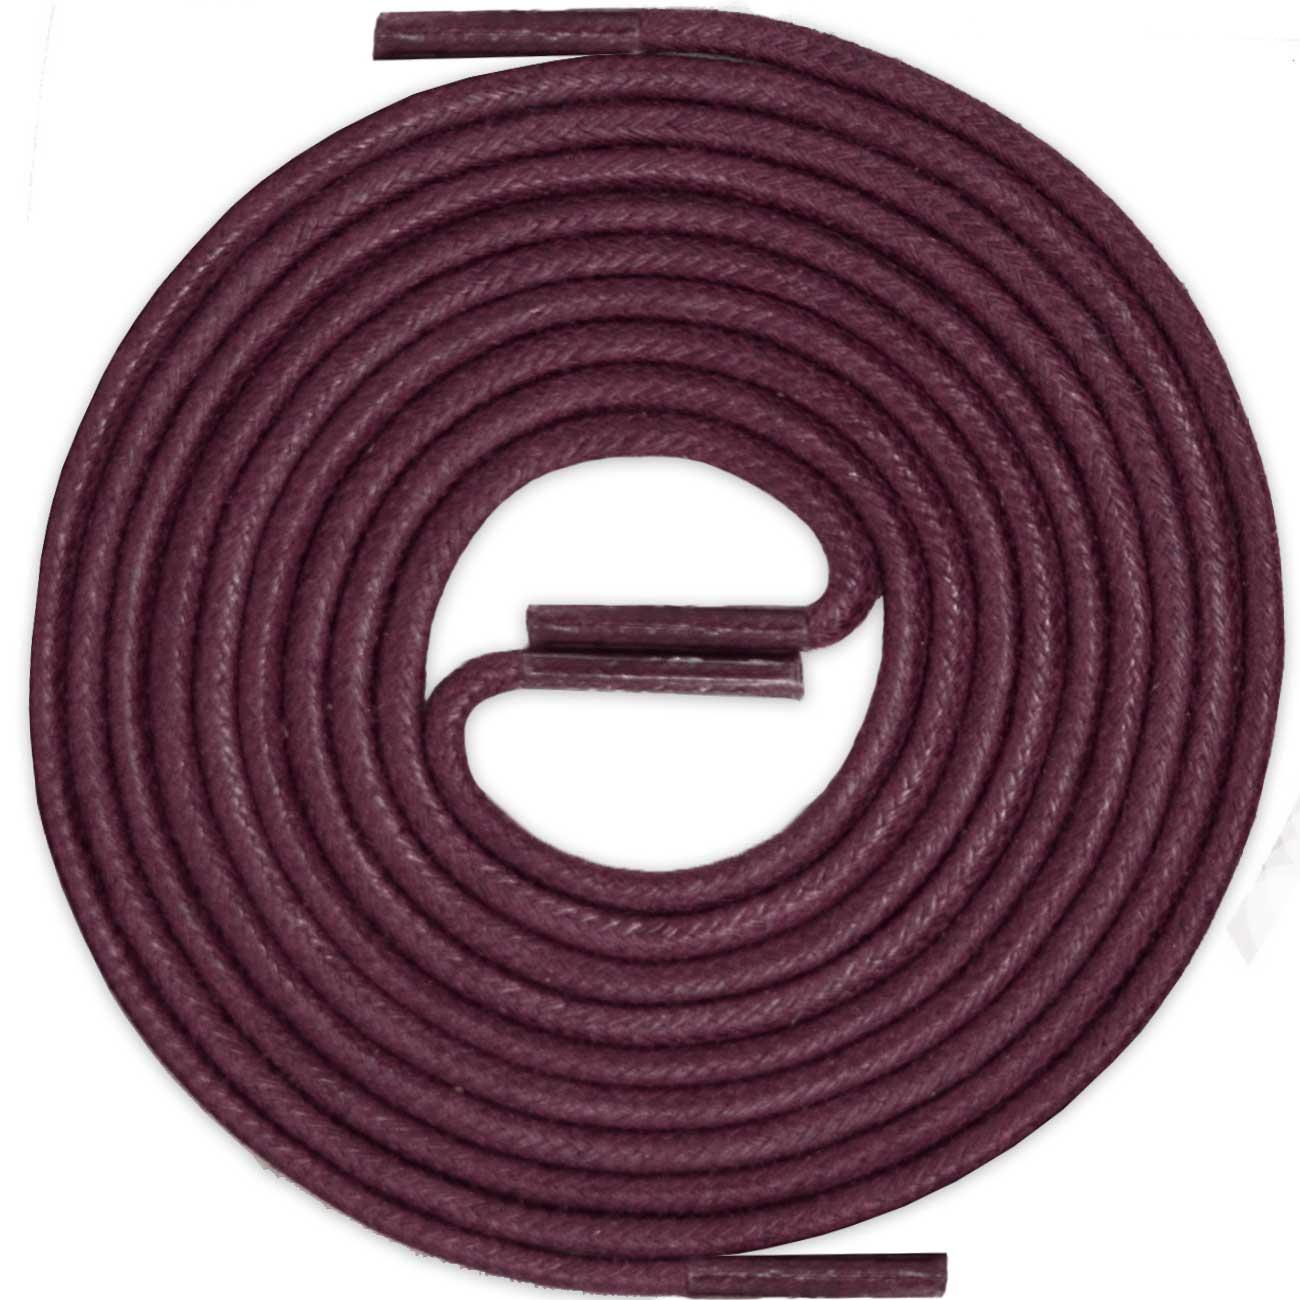 BURGUNDY Thin Elegant Round Waxed Shoelaces Diameter 2 mm